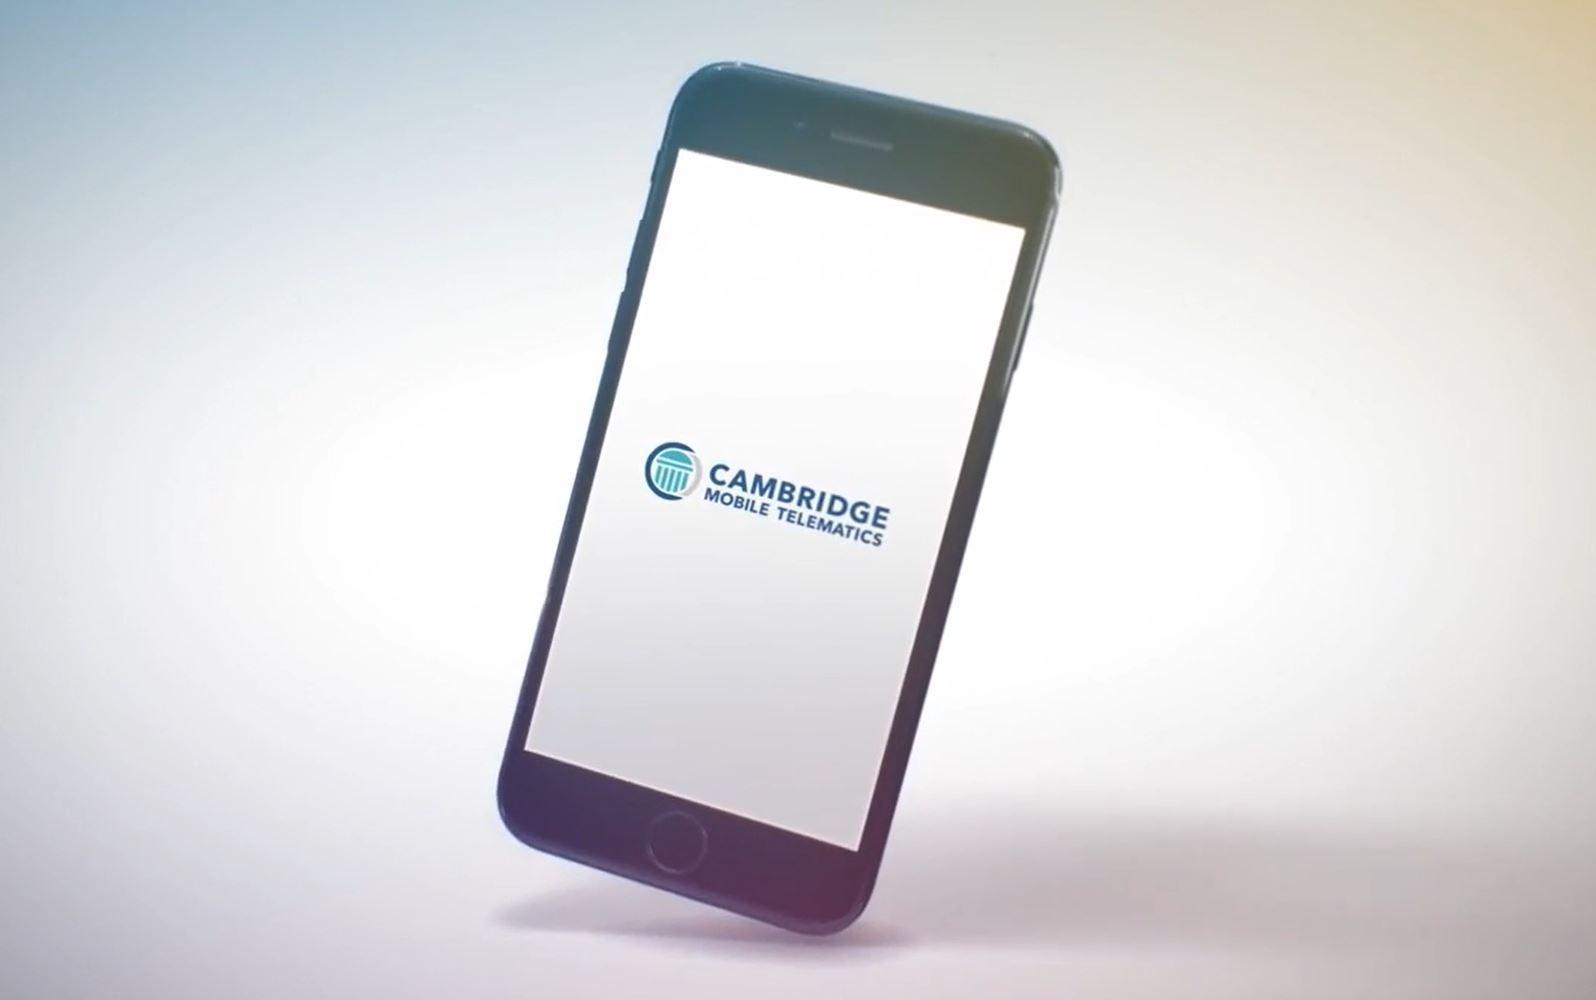 Cambridge Mobile Telematics Releases Safe Driving Platform